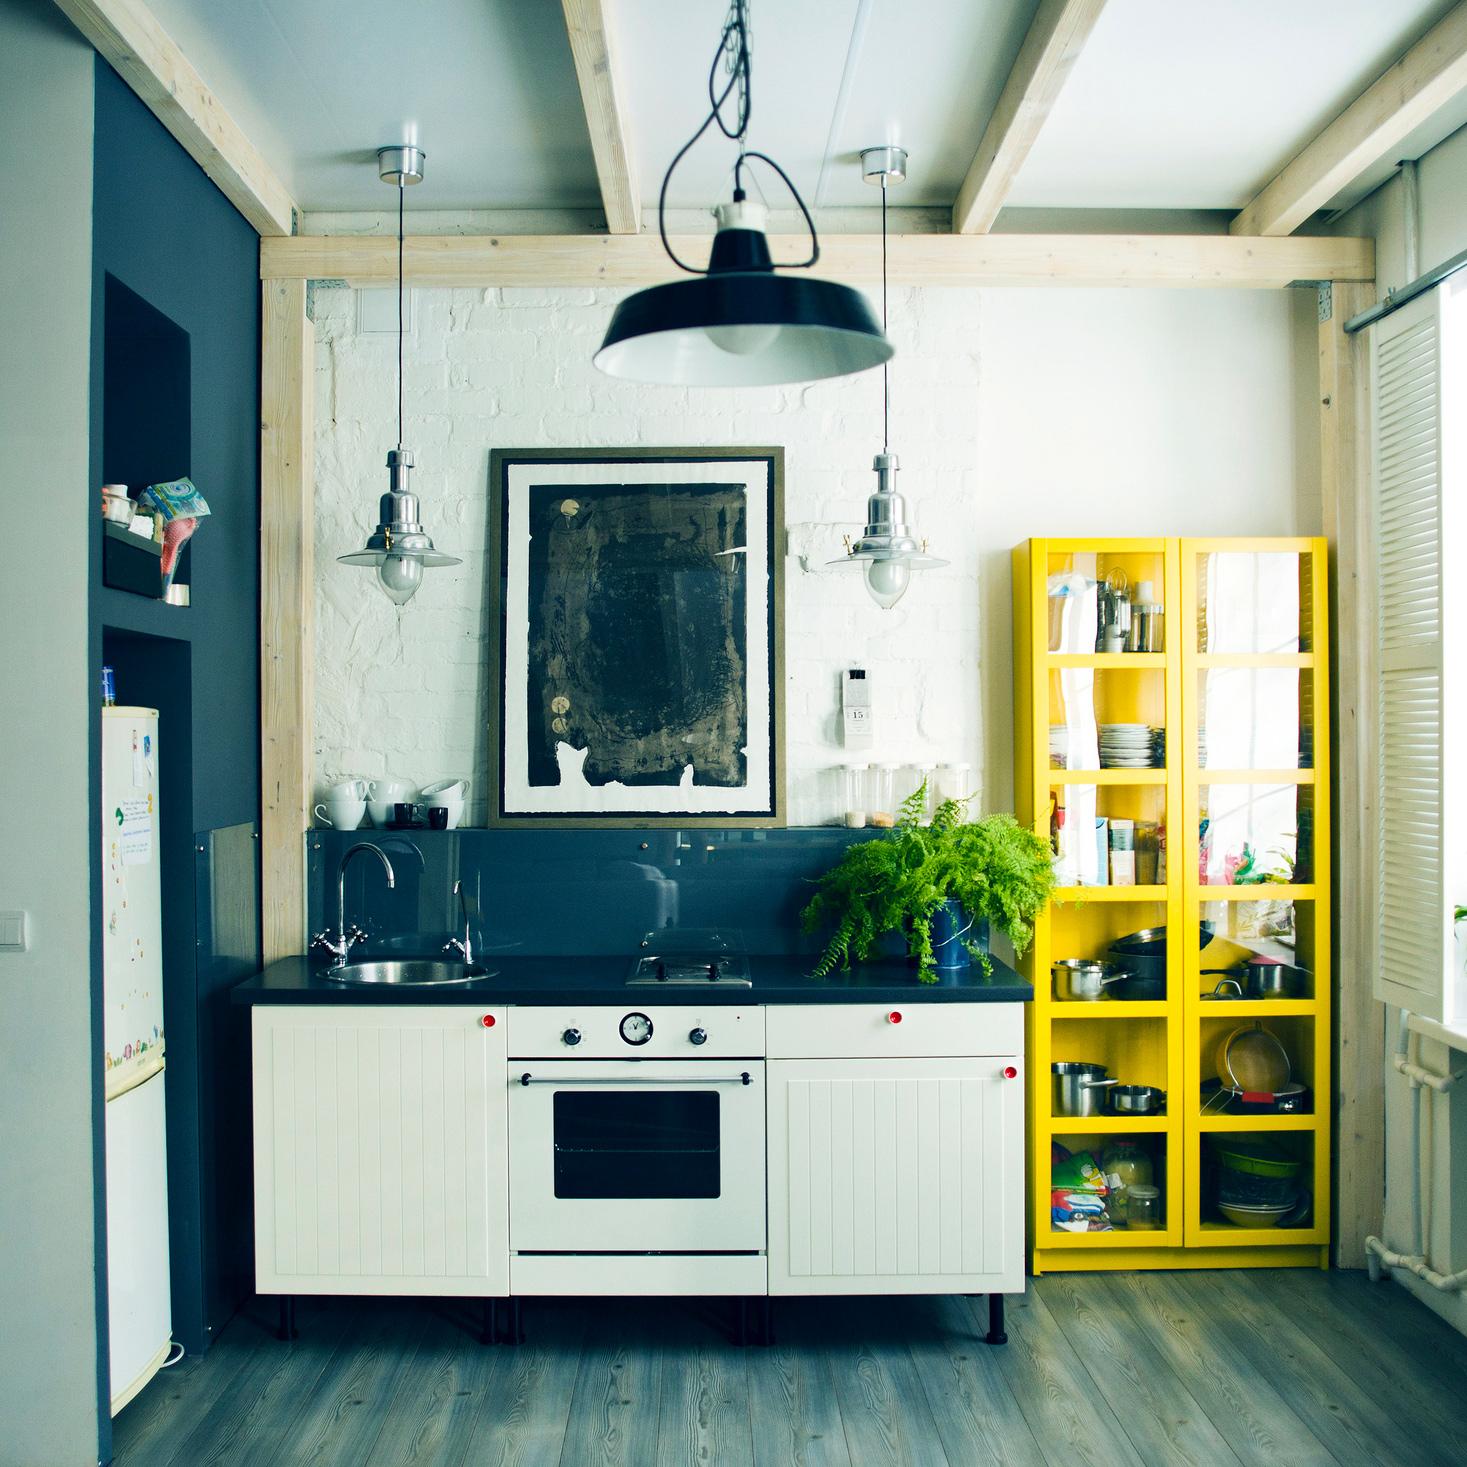 comment nettoyer son four elle table. Black Bedroom Furniture Sets. Home Design Ideas